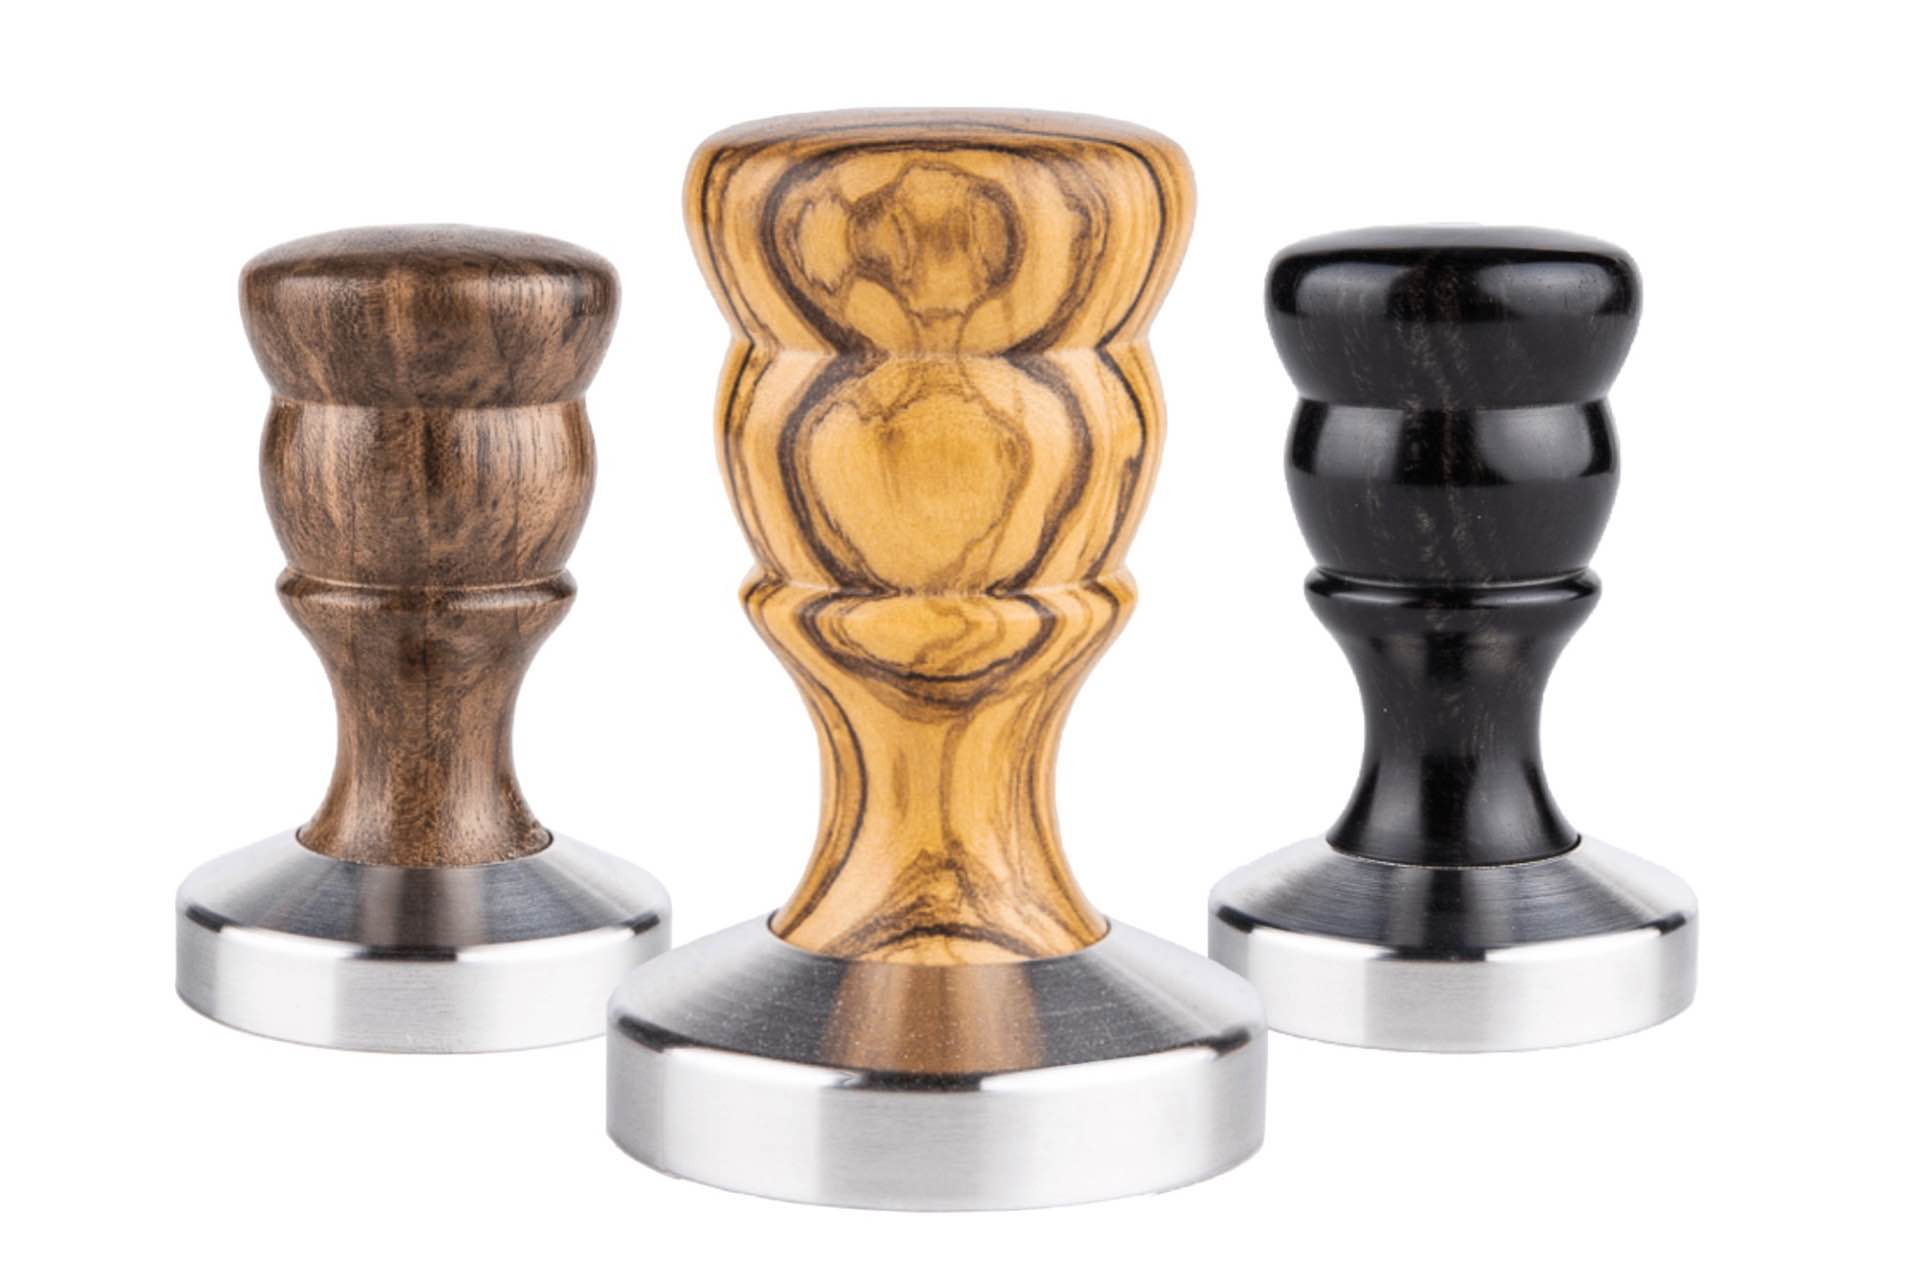 mussa-hera-wooden-espresso-tampers